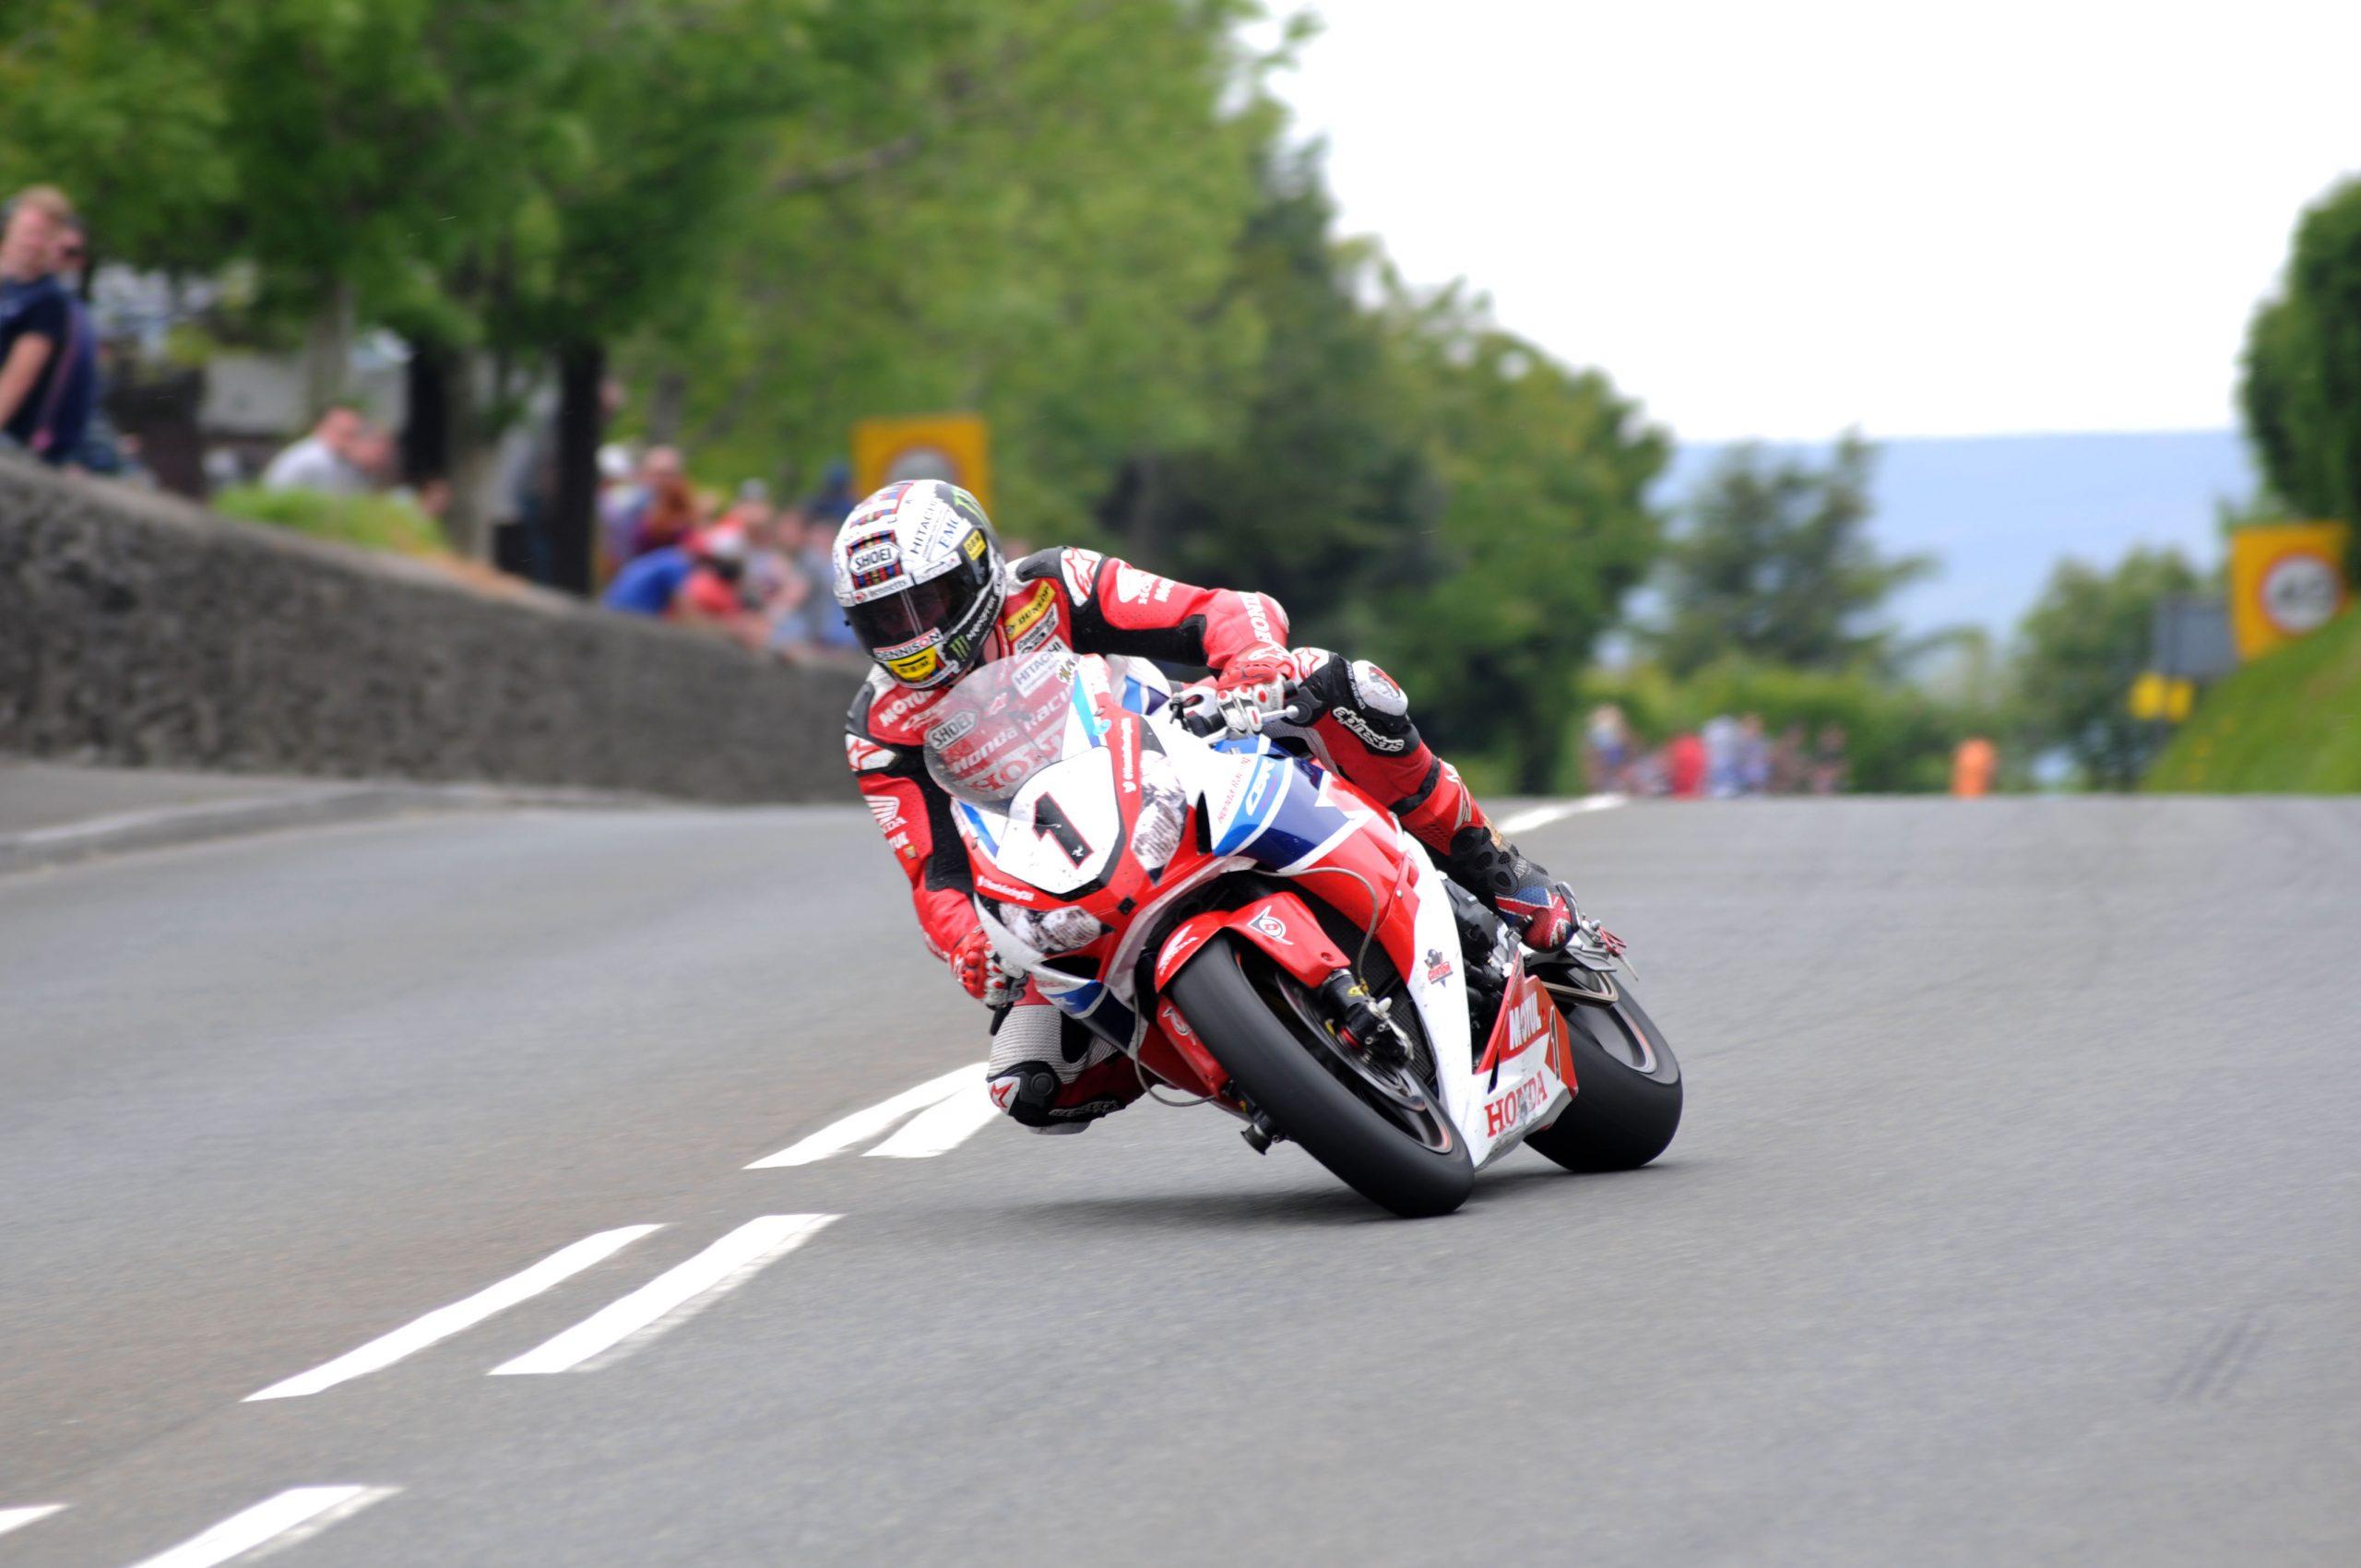 John McGuinness winning the Senior TT image by Pacemaker Press International